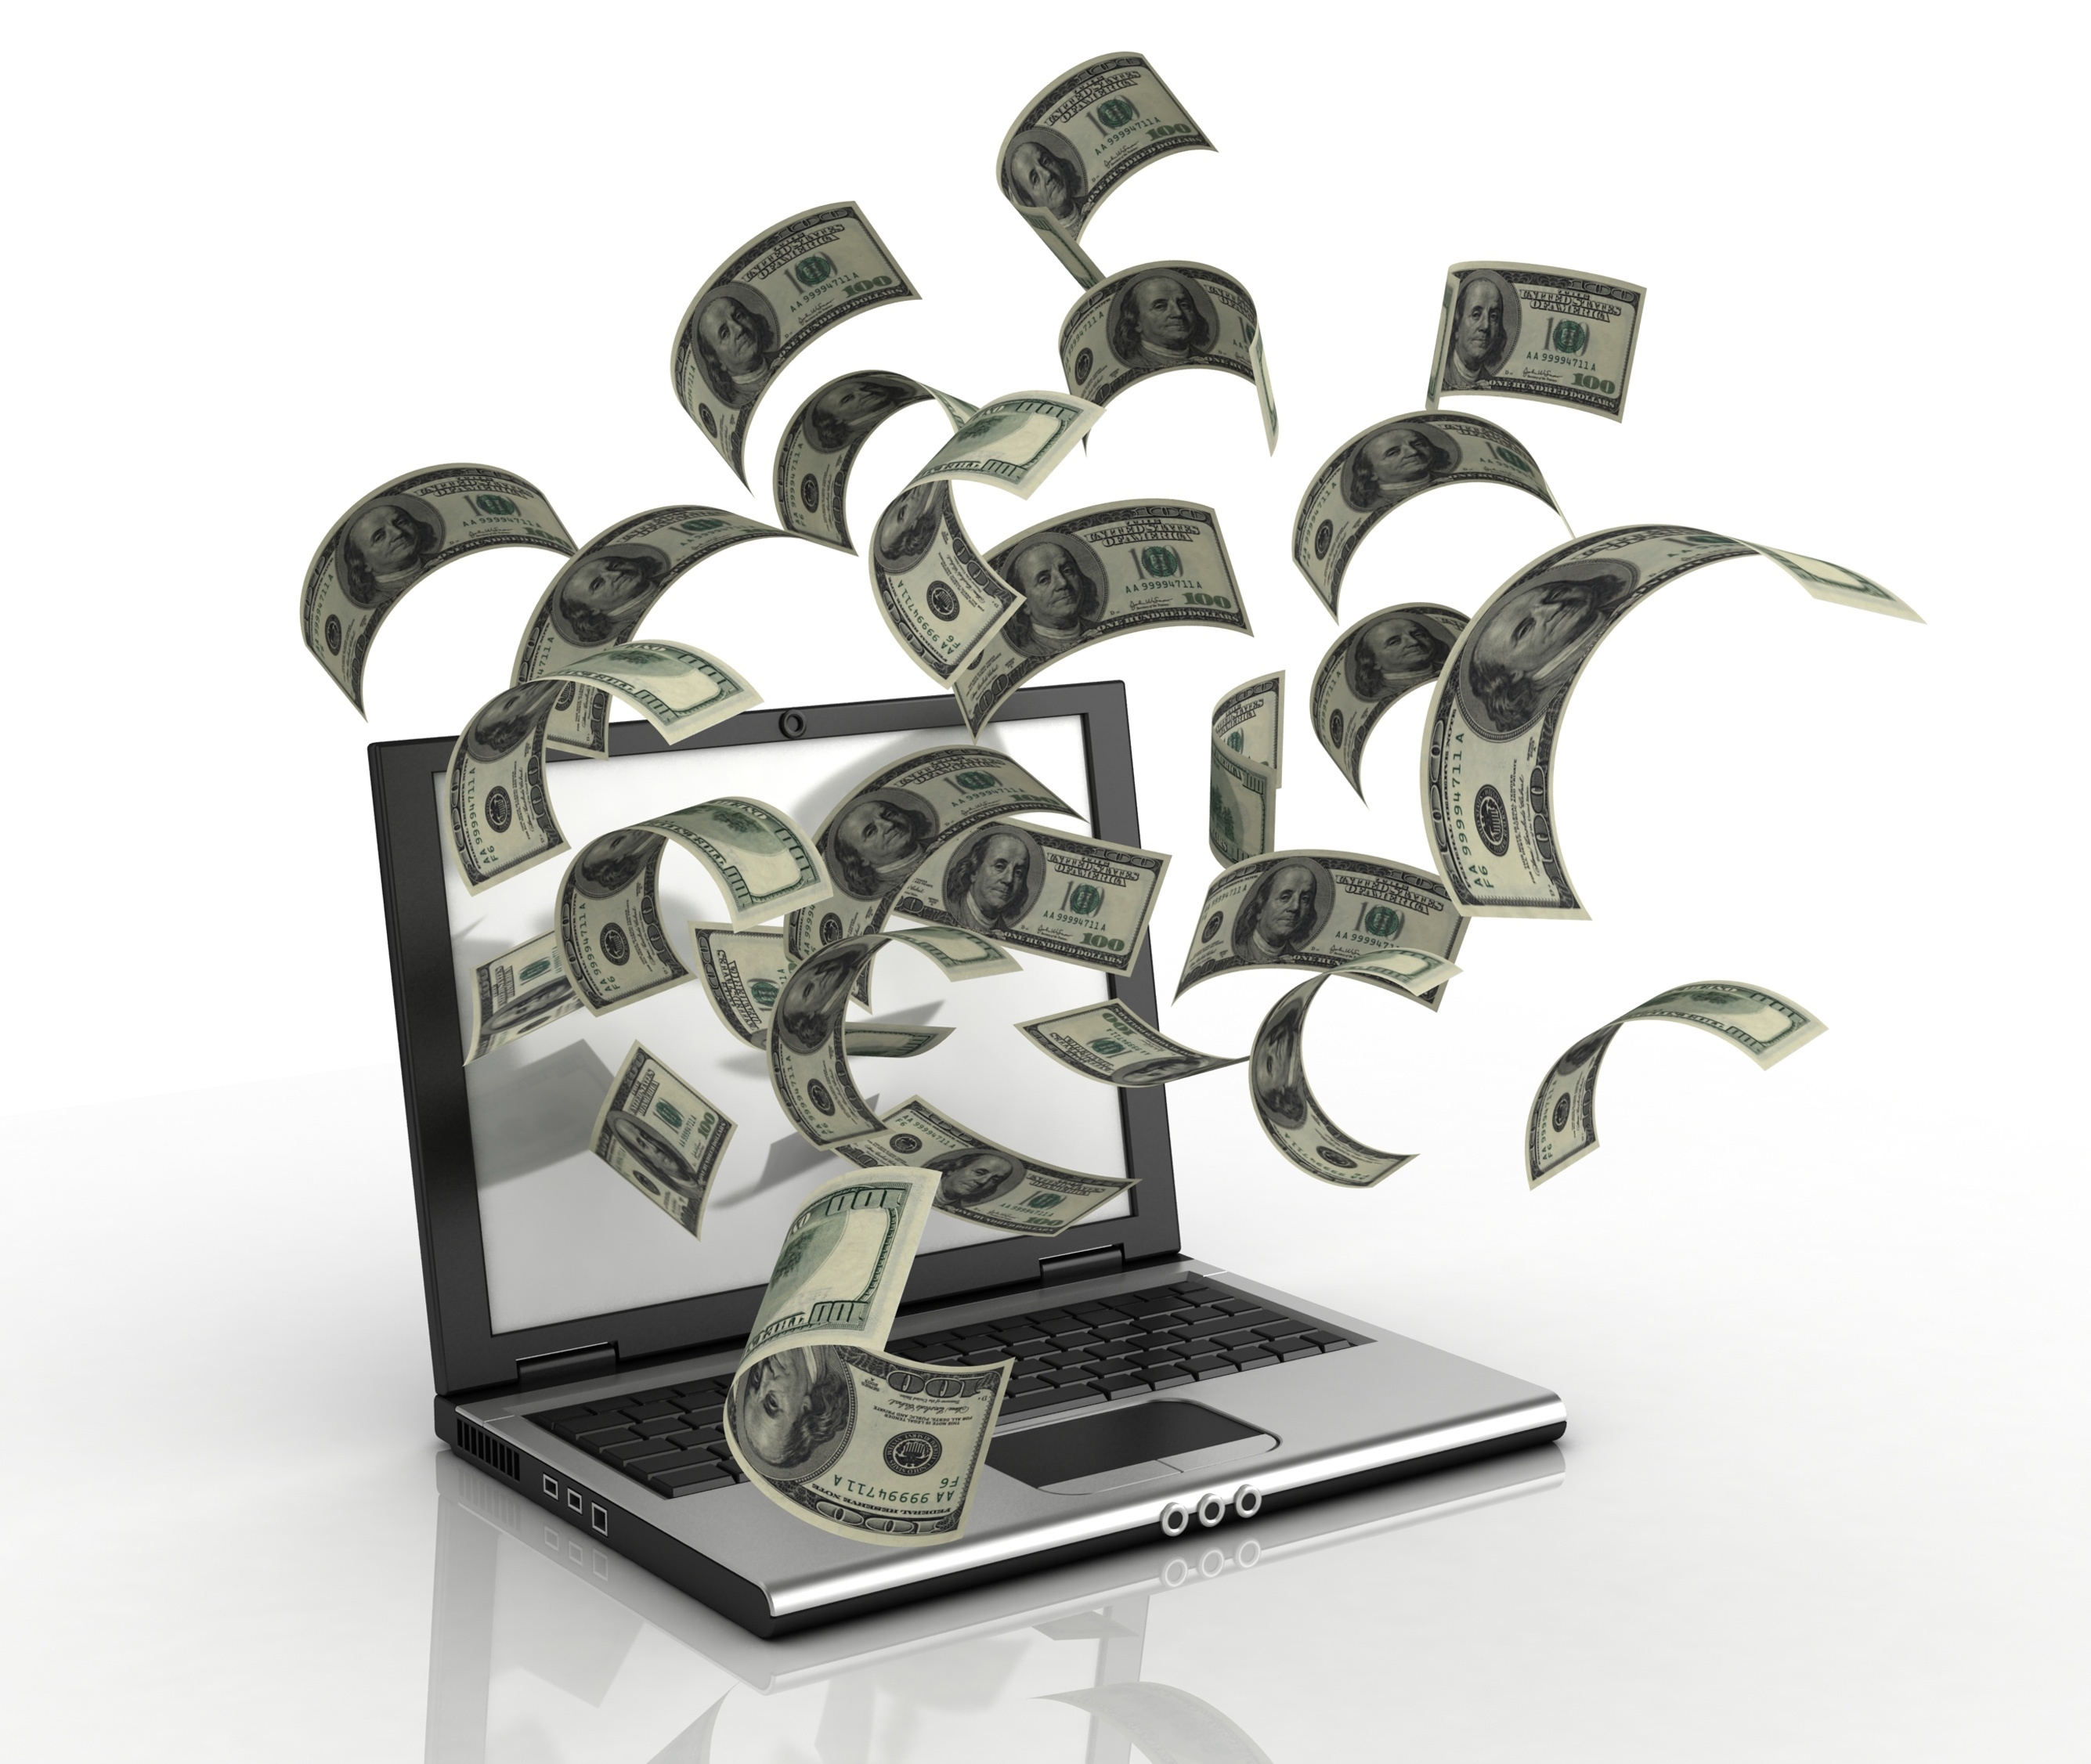 Pay Registration Online Ca >> Online subscription TV spending set to surge